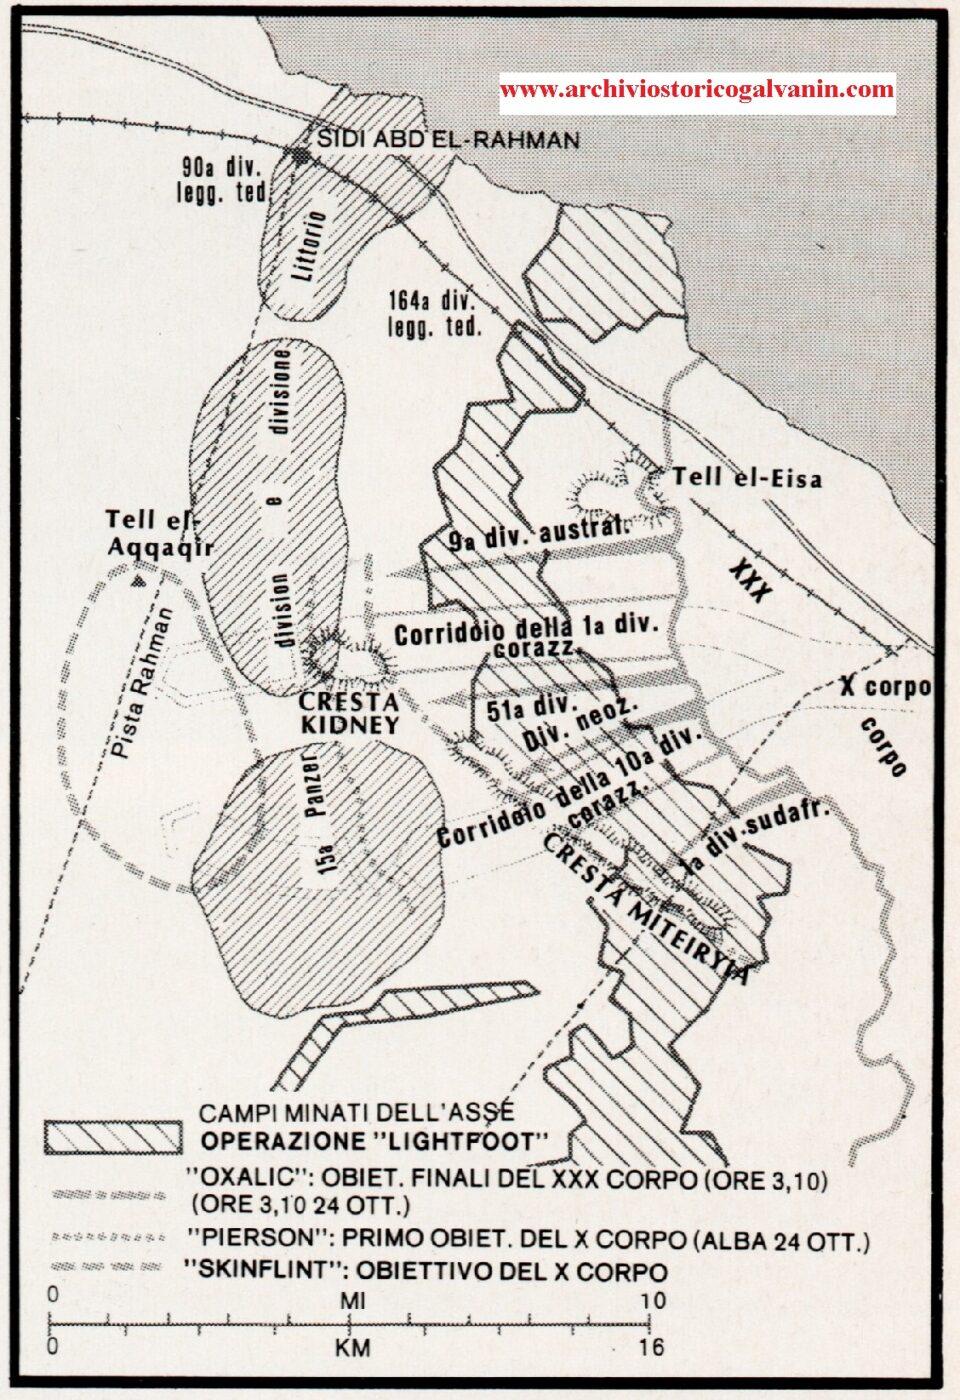 El Alamein 1942 posizioni mappa, operazione lightfoot, Tell el aqqaqllr, Cresta Kidney, 15 panzer divisioni El Alamein, divisione littorio El Alamein, 1 divsione corazzata, Cresta Miteirym, Tell el Eisa, 9 divisione australiana, 51 divisione neozelandese, 1 divisione sud africana